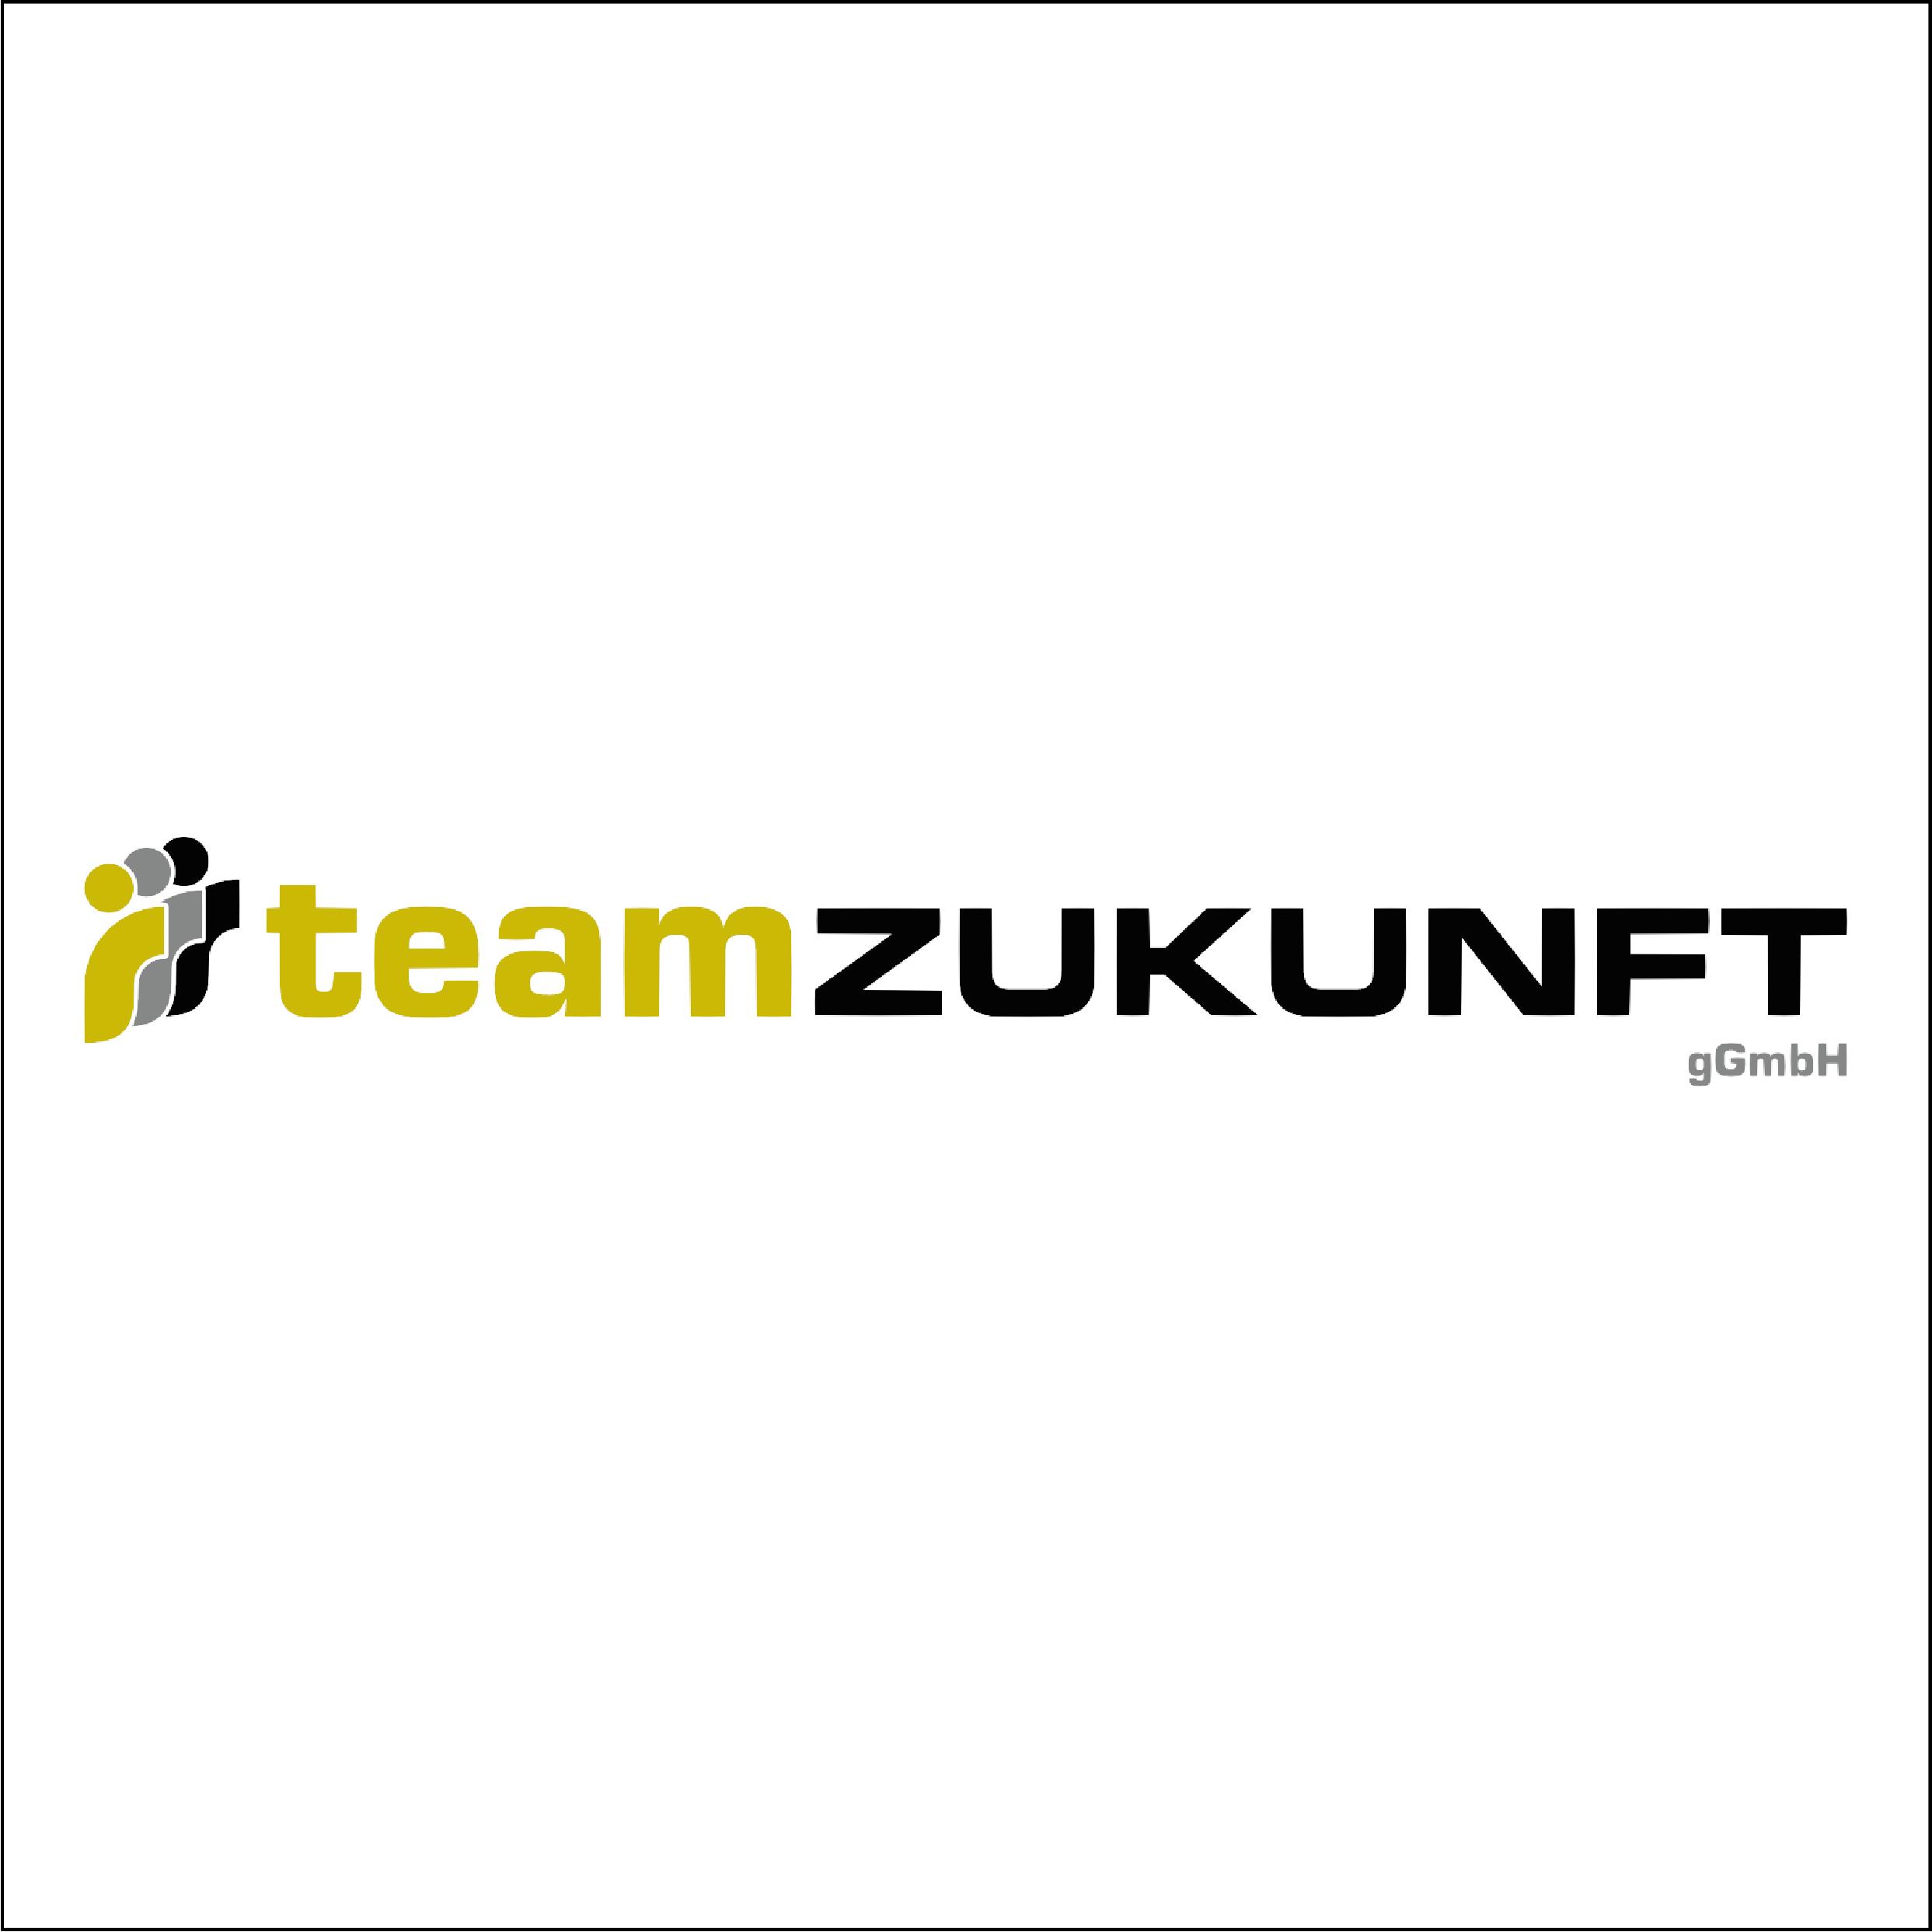 teamZUKUNFT gGmbH